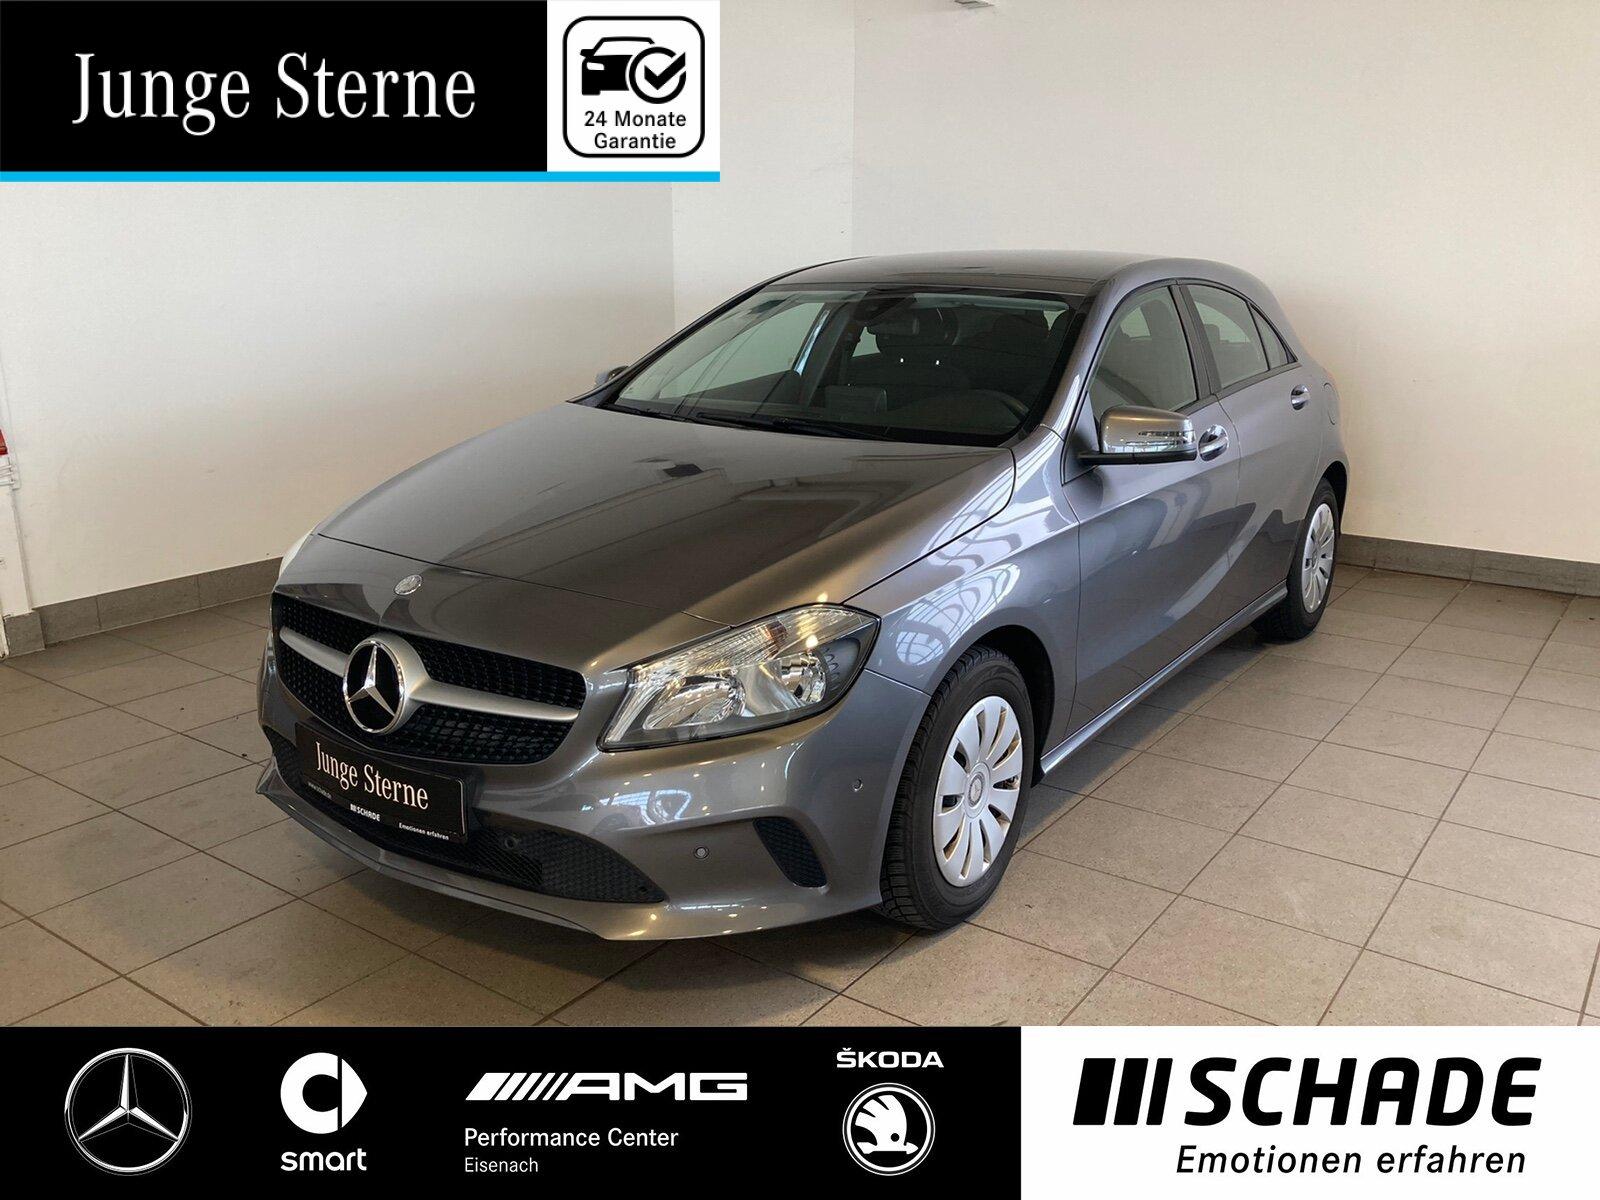 Mercedes-Benz A 180 Navi*Park-Assist.*Sitzheizung* Klima/R-CD, Jahr 2016, Benzin